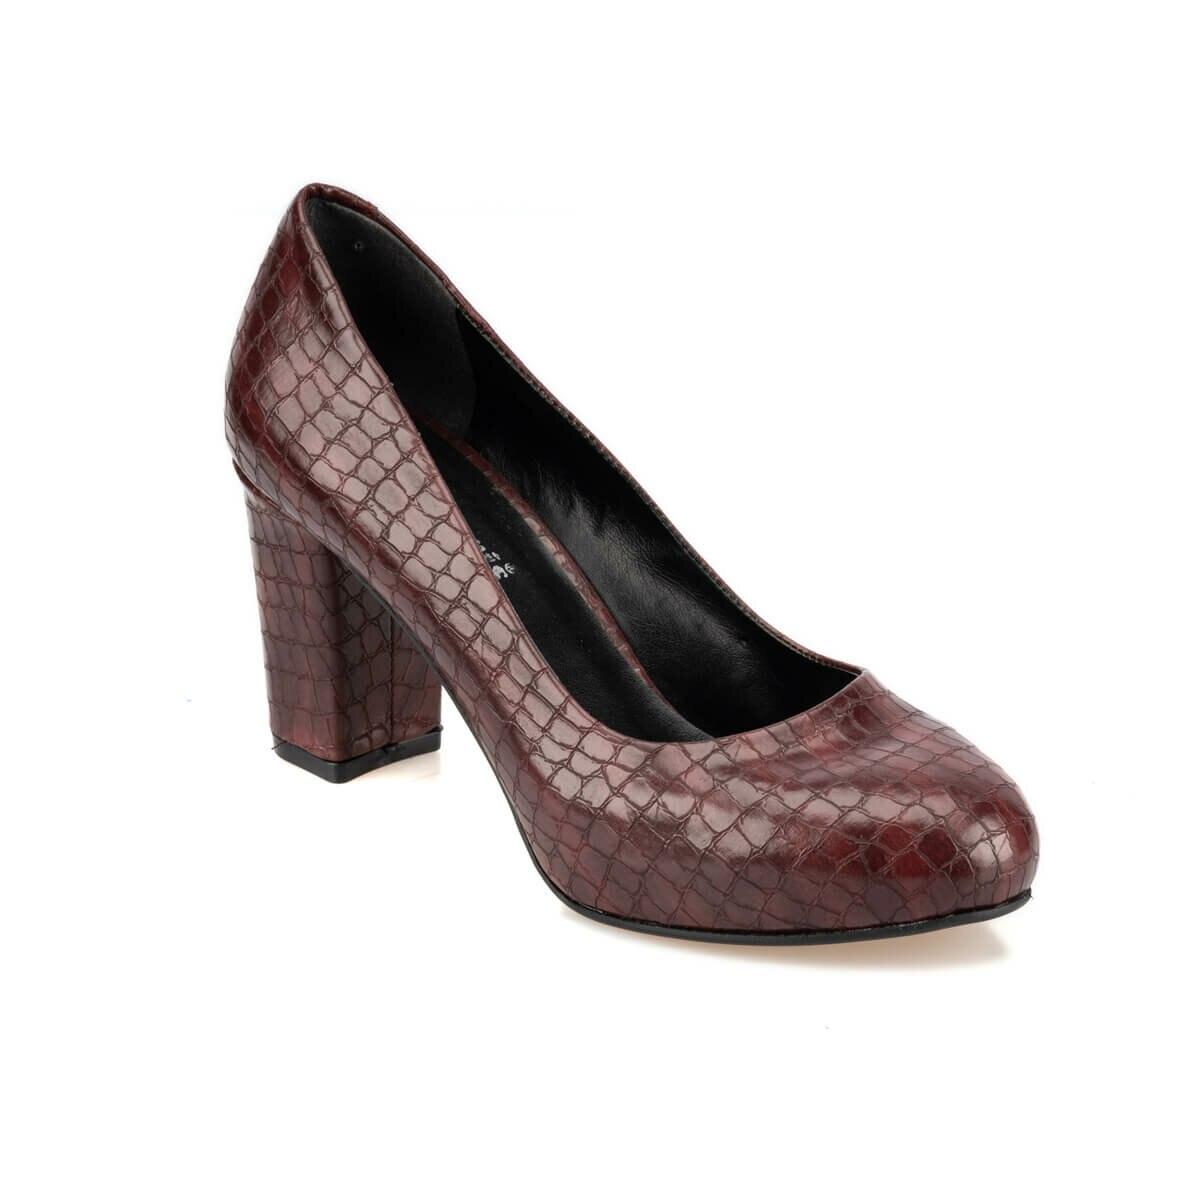 FLO 92.313153YZ Burgundy Women 'S Shoes Polaris